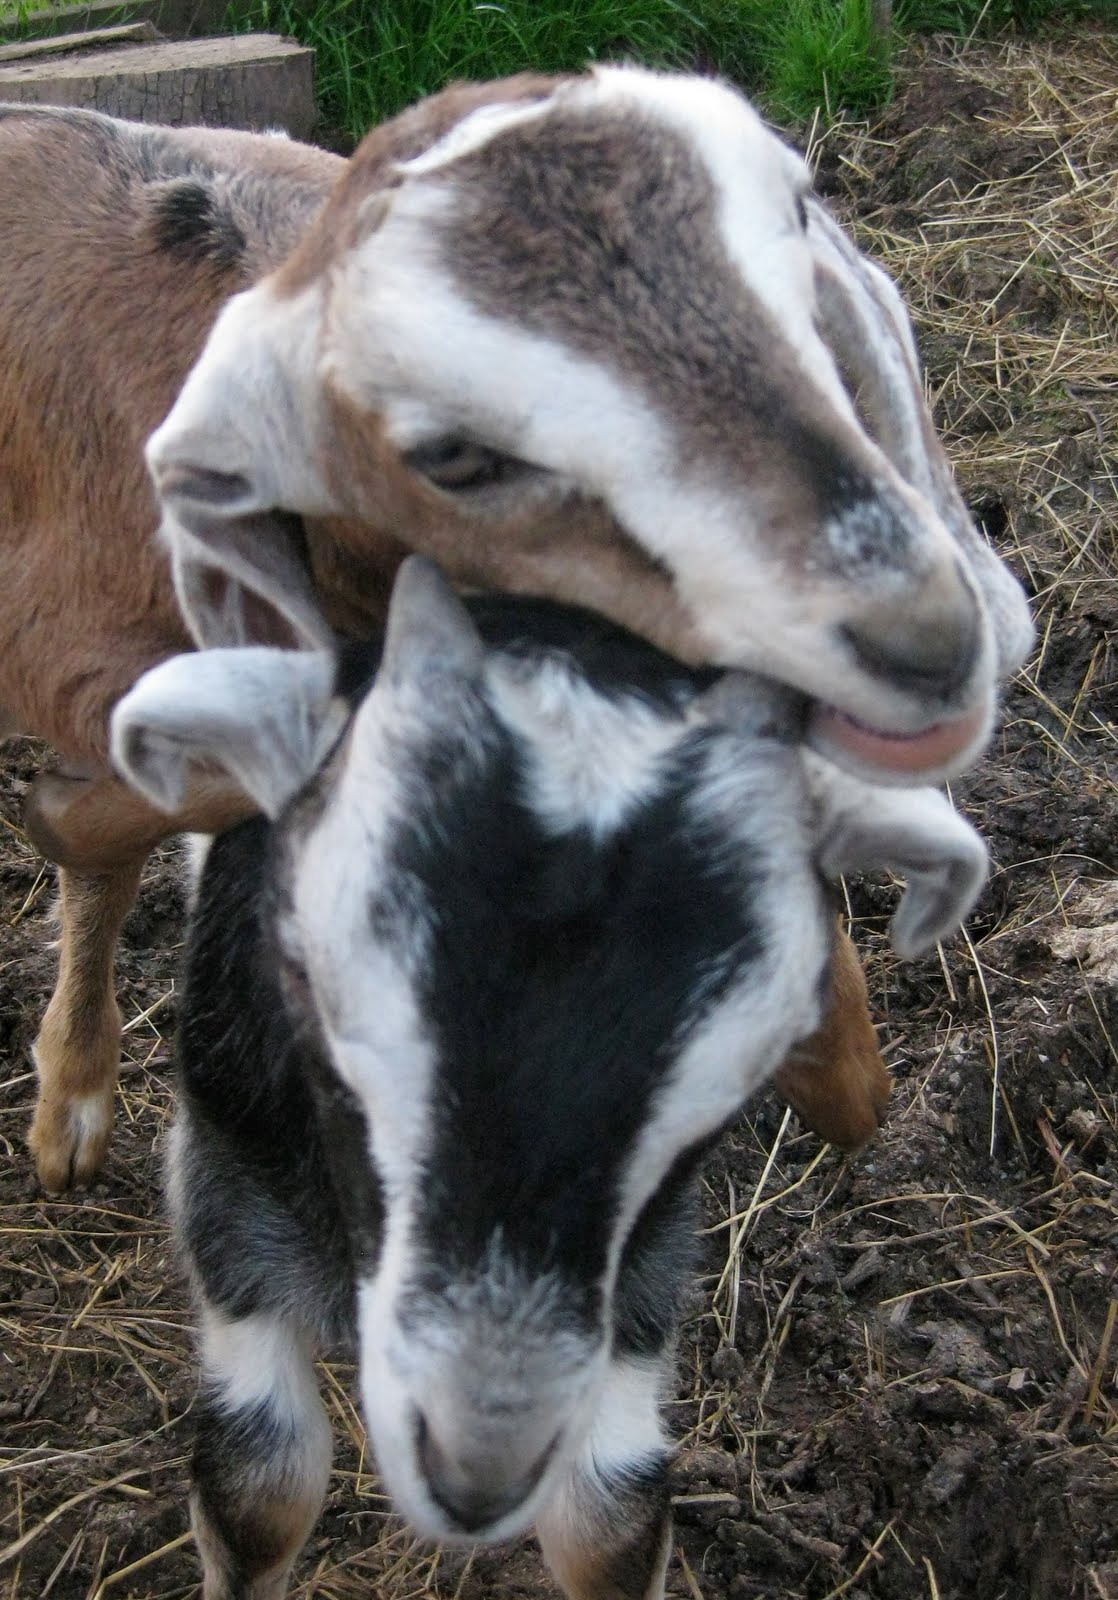 Solar Living: Urban Homesteading: How to Raise Backyard Goats Raising Goats